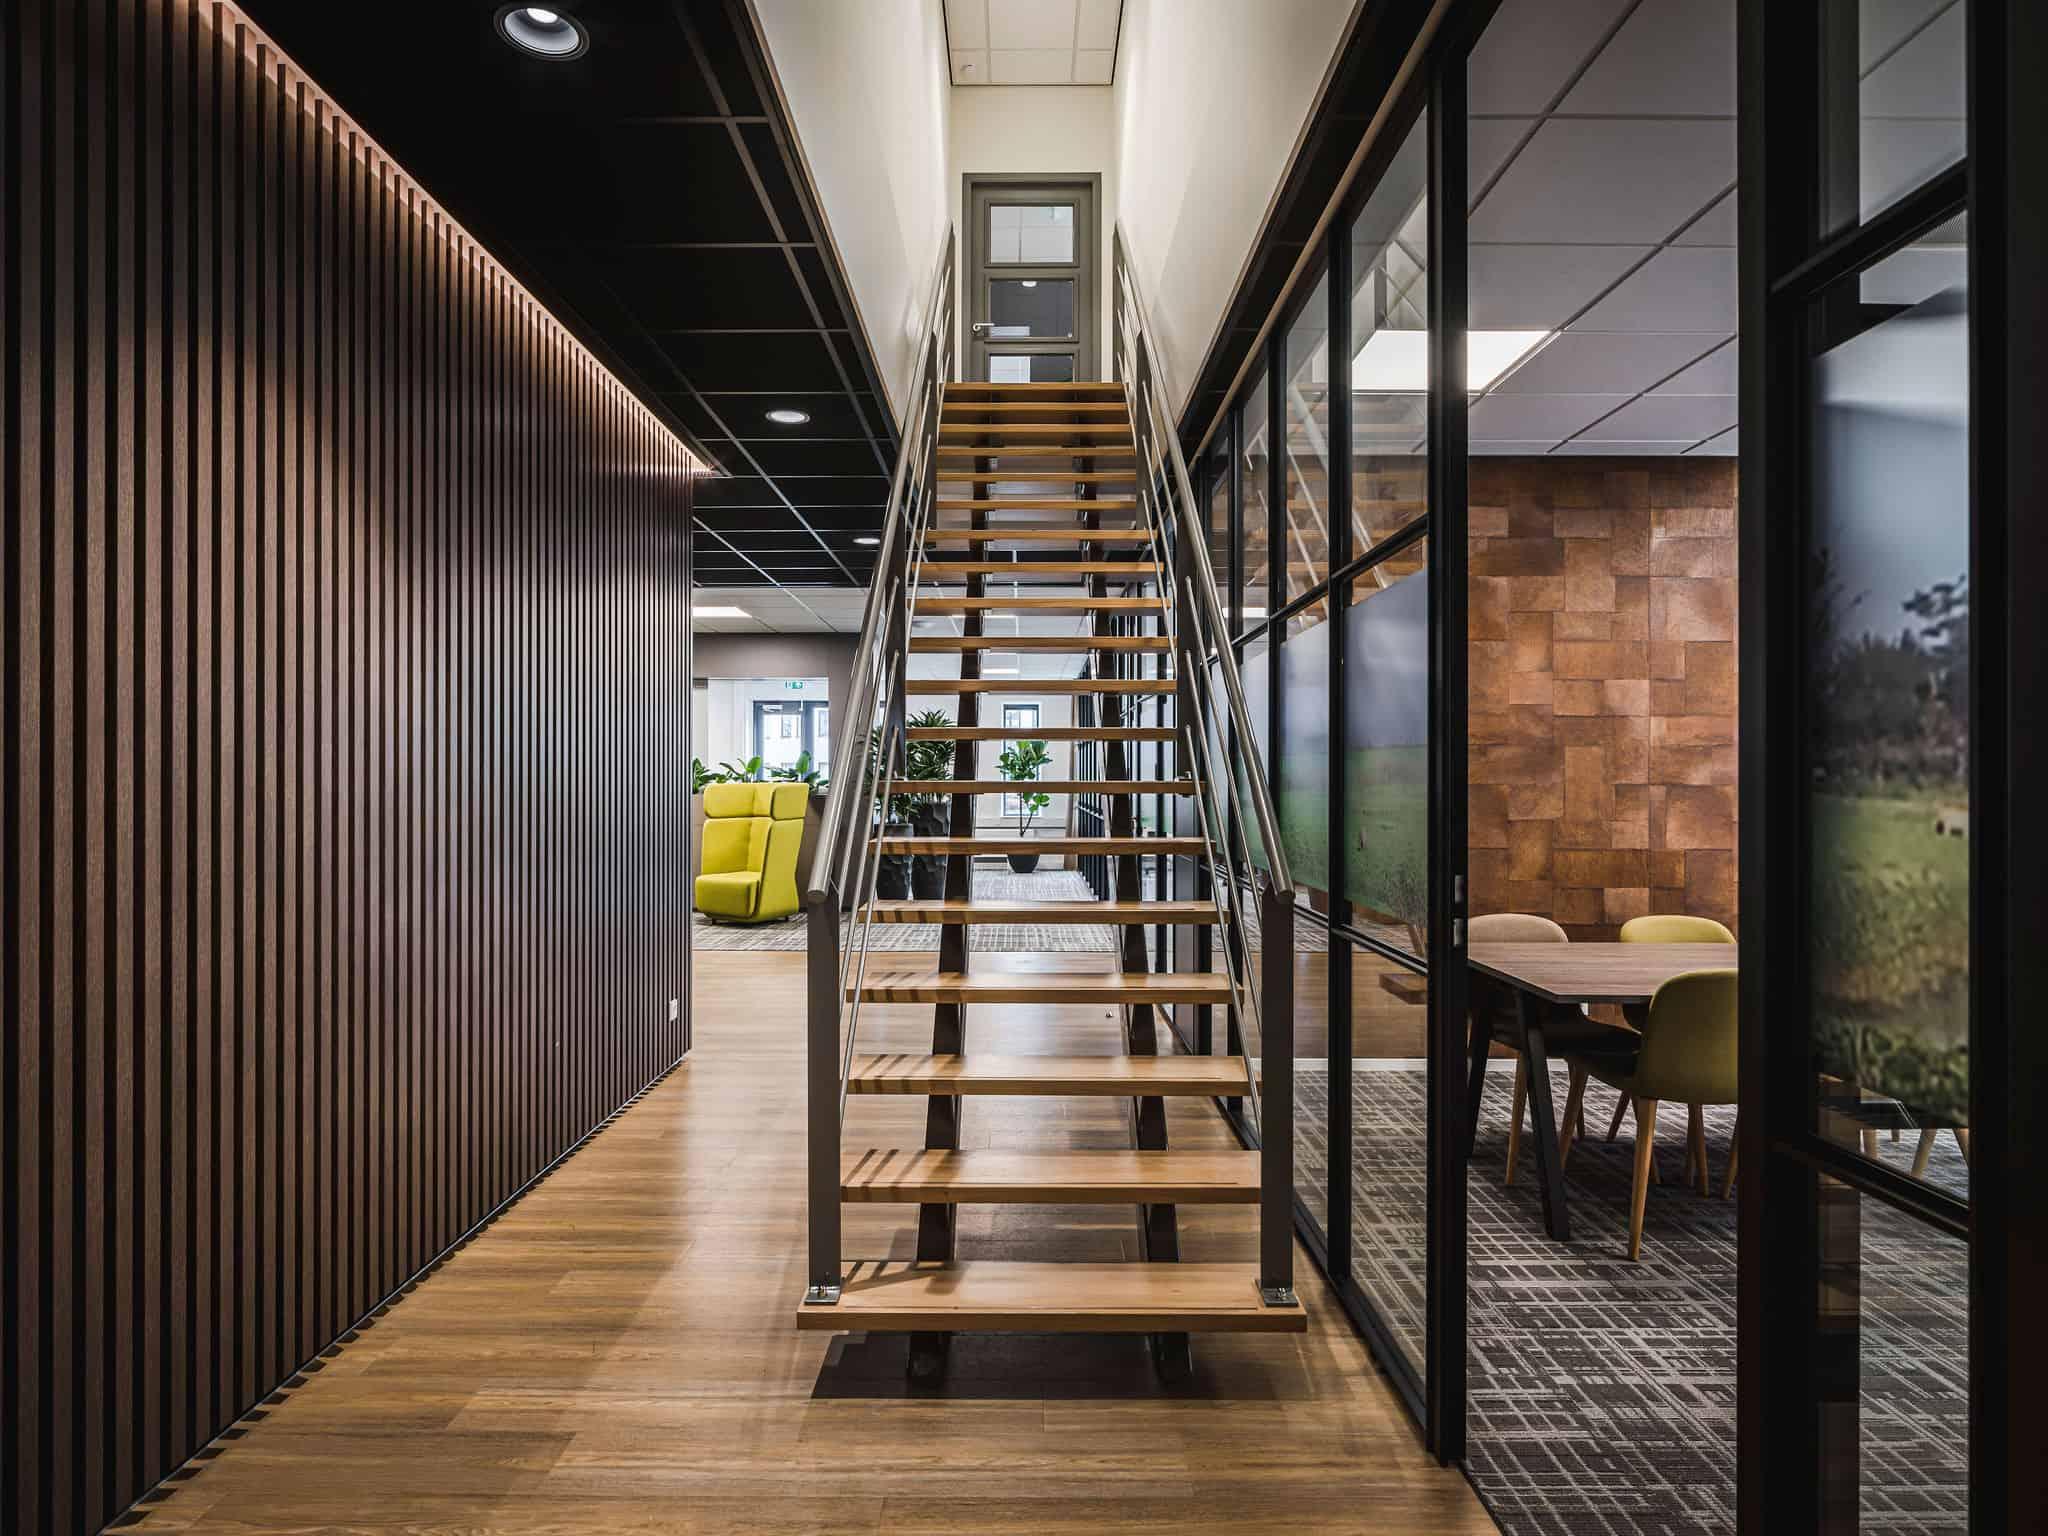 binnenhuisarchitect Wildenberg ontwerp COKZ vergaderruimte Fijri, Planeffect